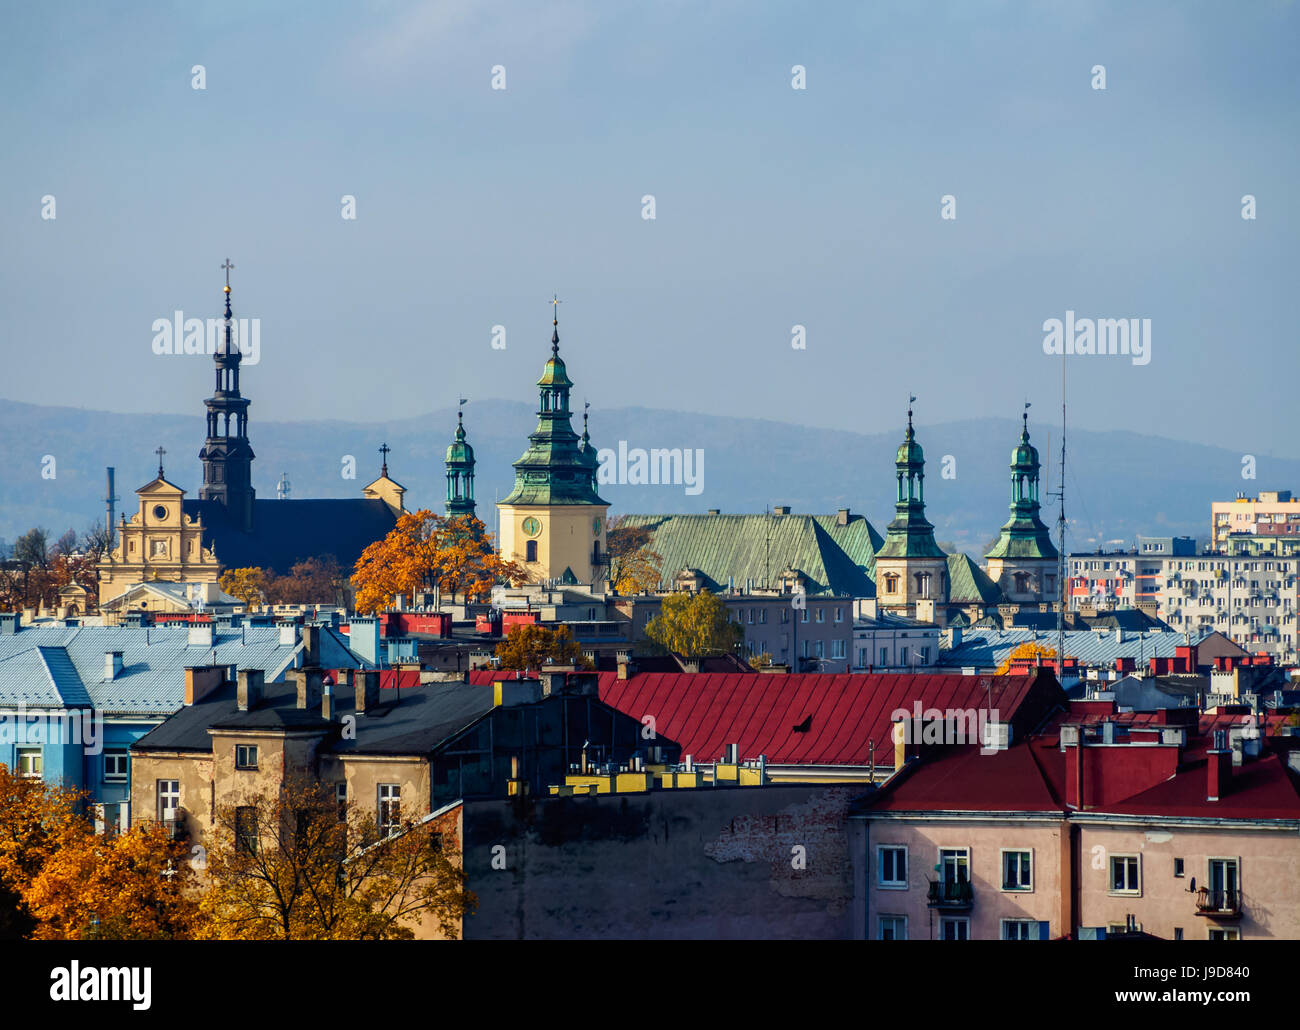 Cityscape, Kielce, Swietokrzyskie voivodato, Polonia, Europa Immagini Stock